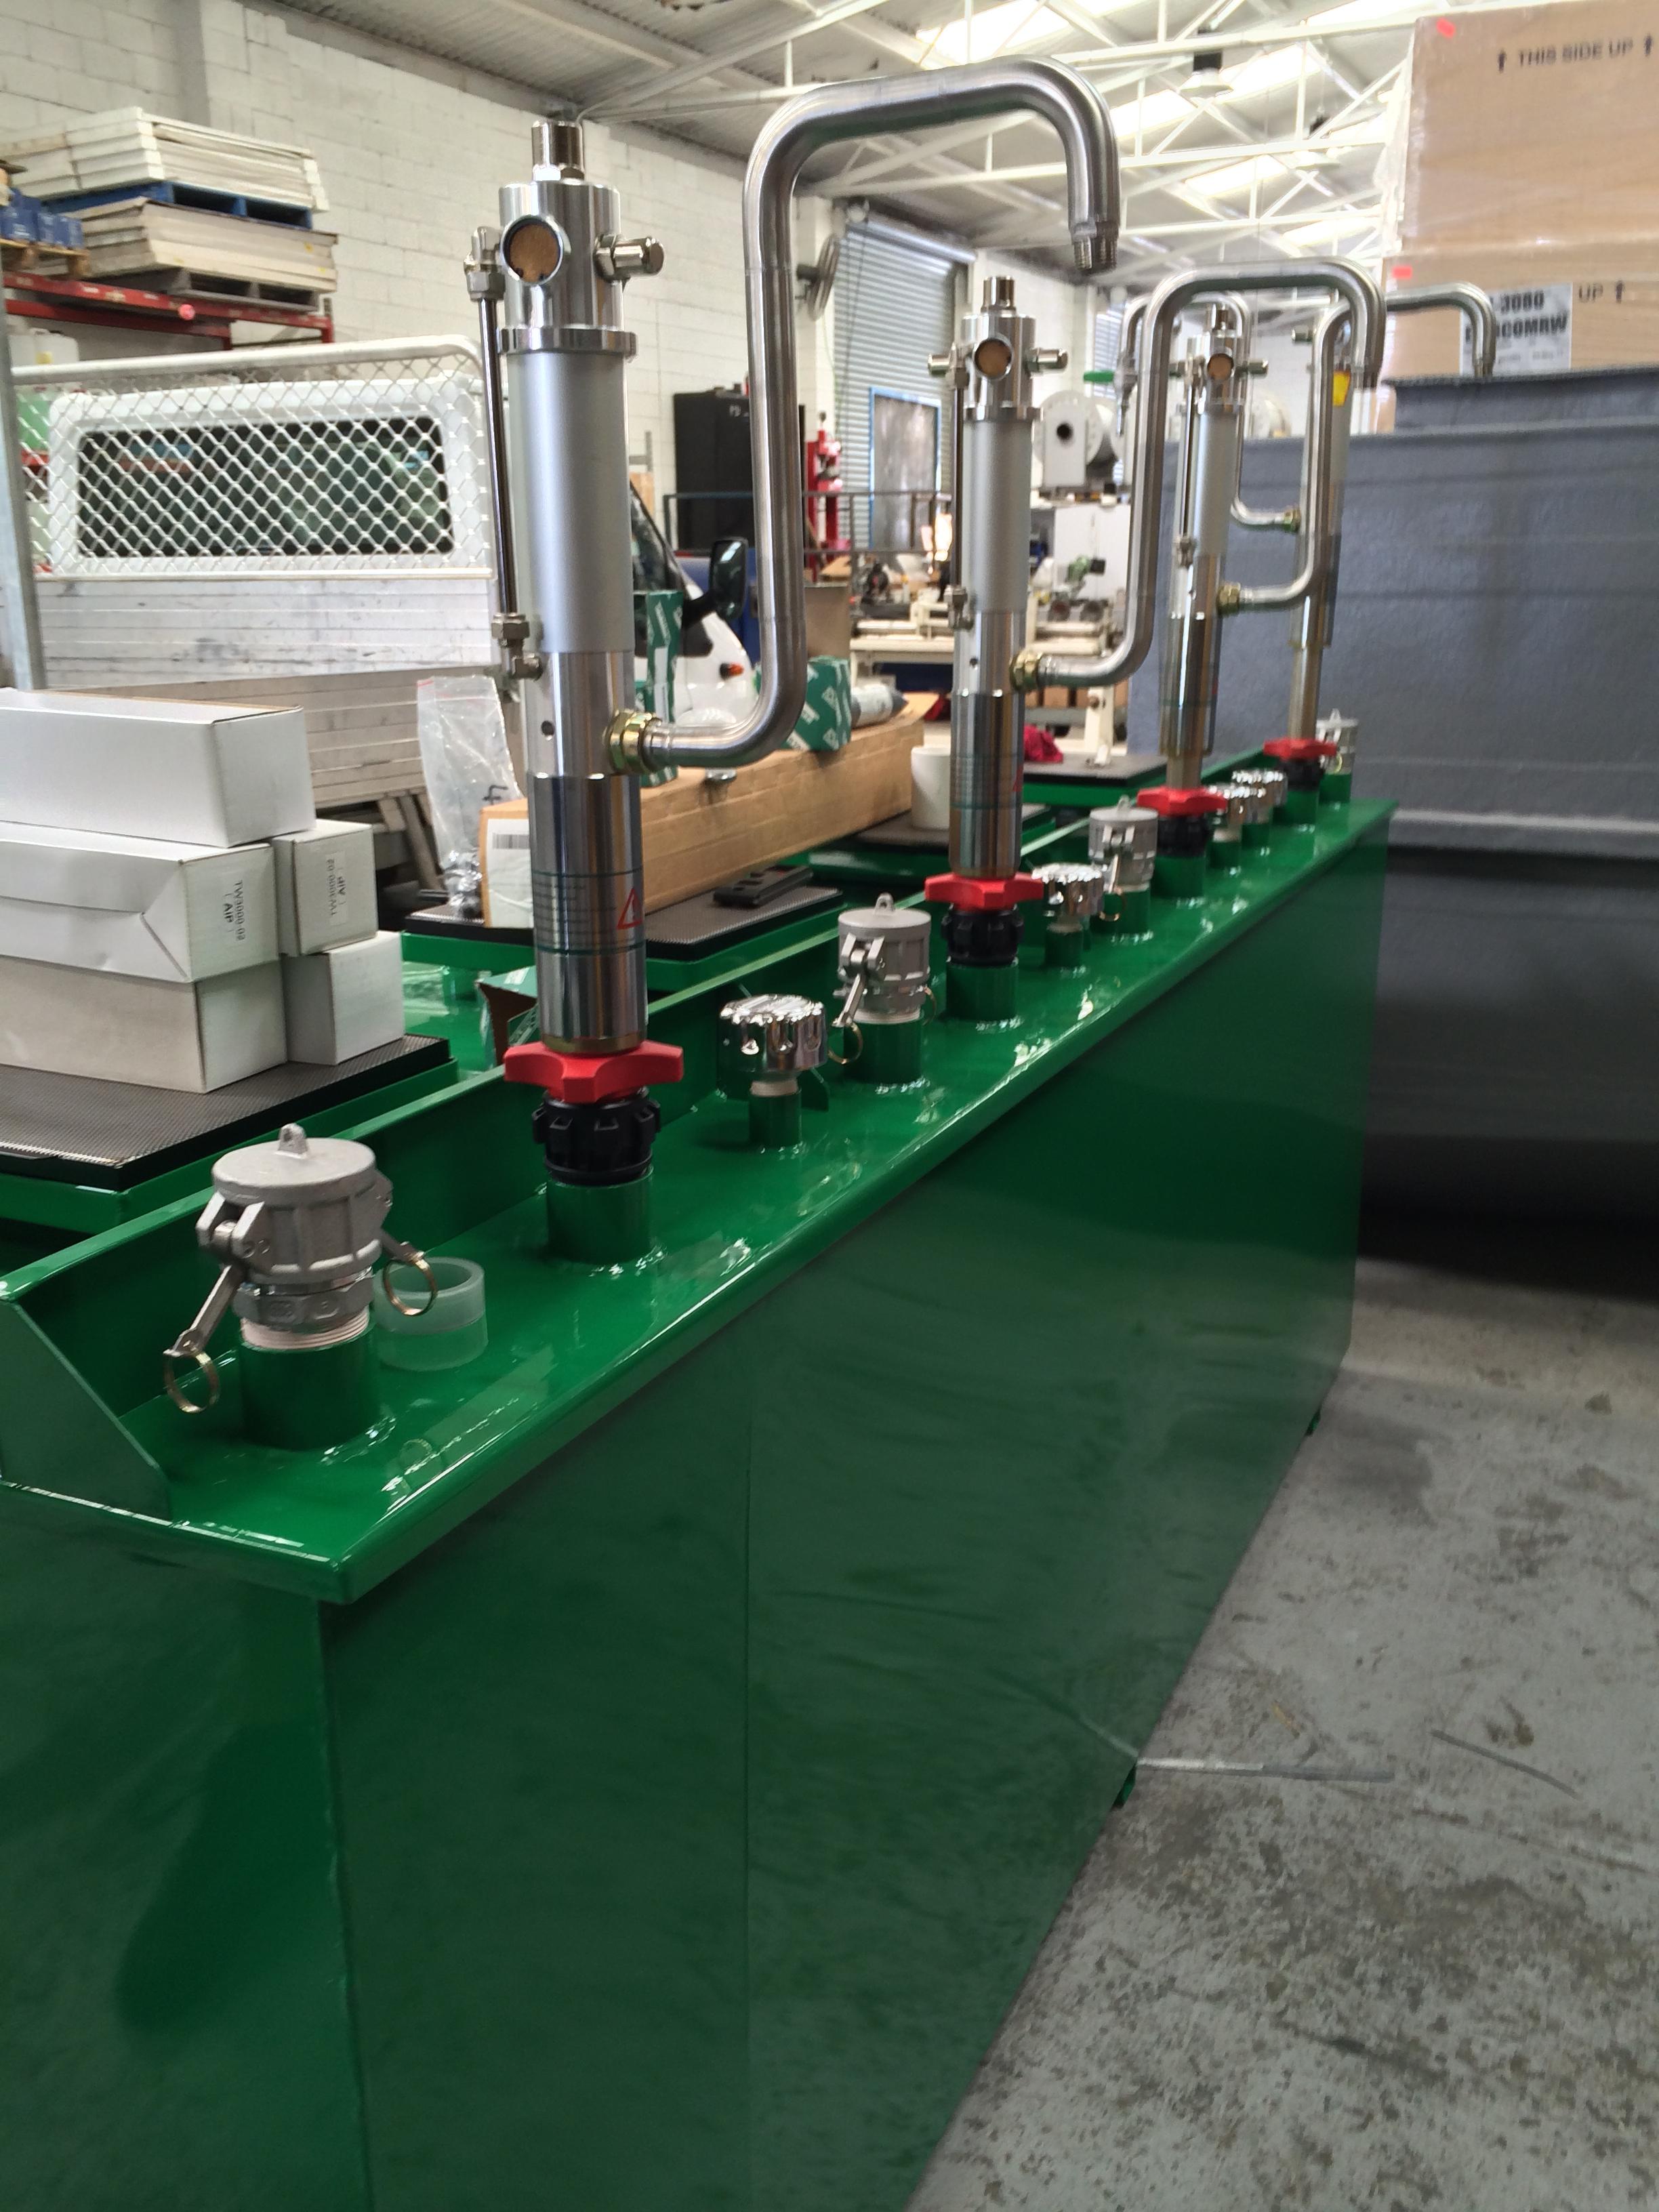 Green Oil Tank.JPG